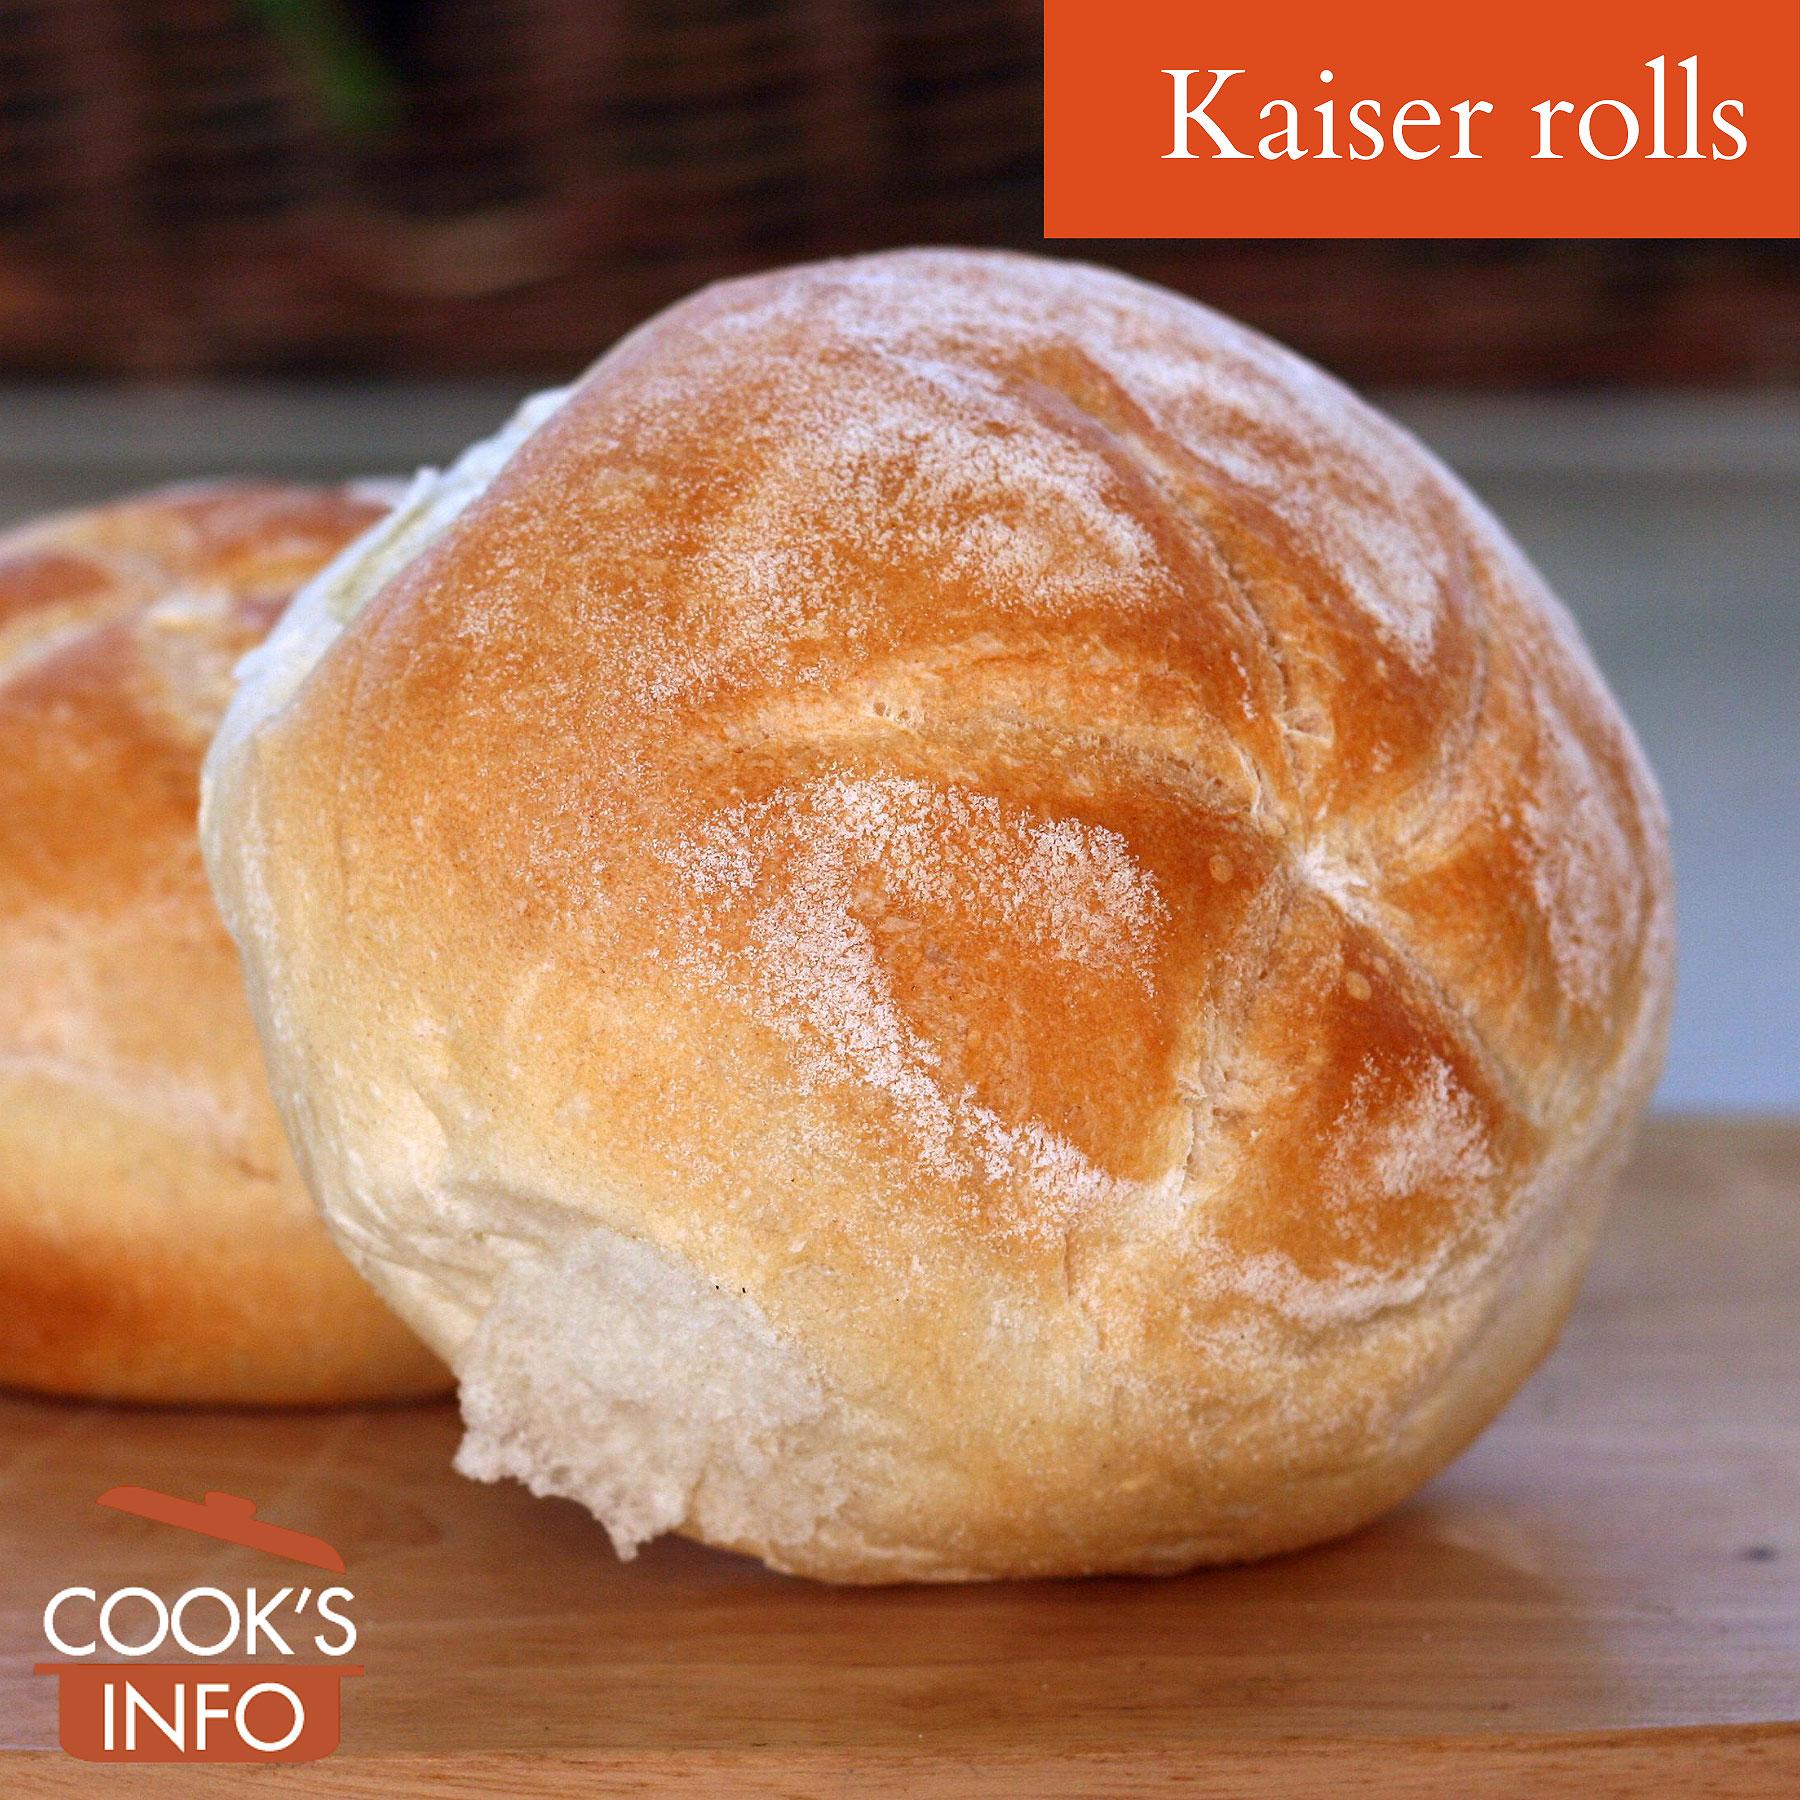 Kaiser rolls